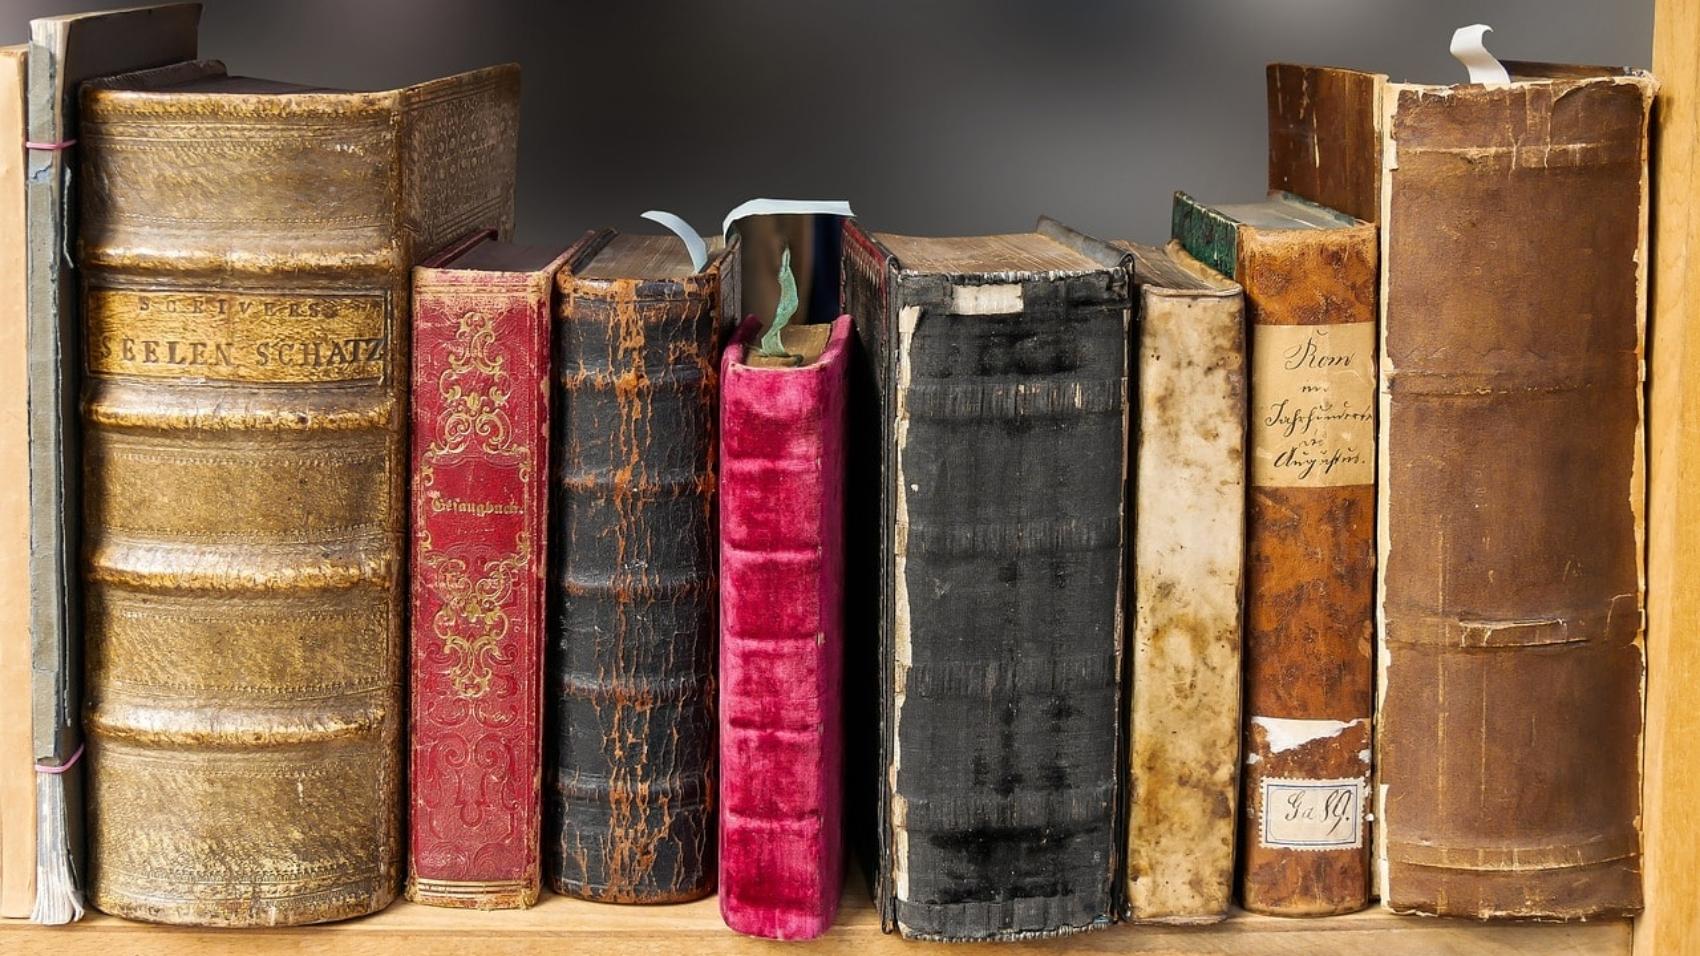 7 Culturally Diverse Books with Unique World Views